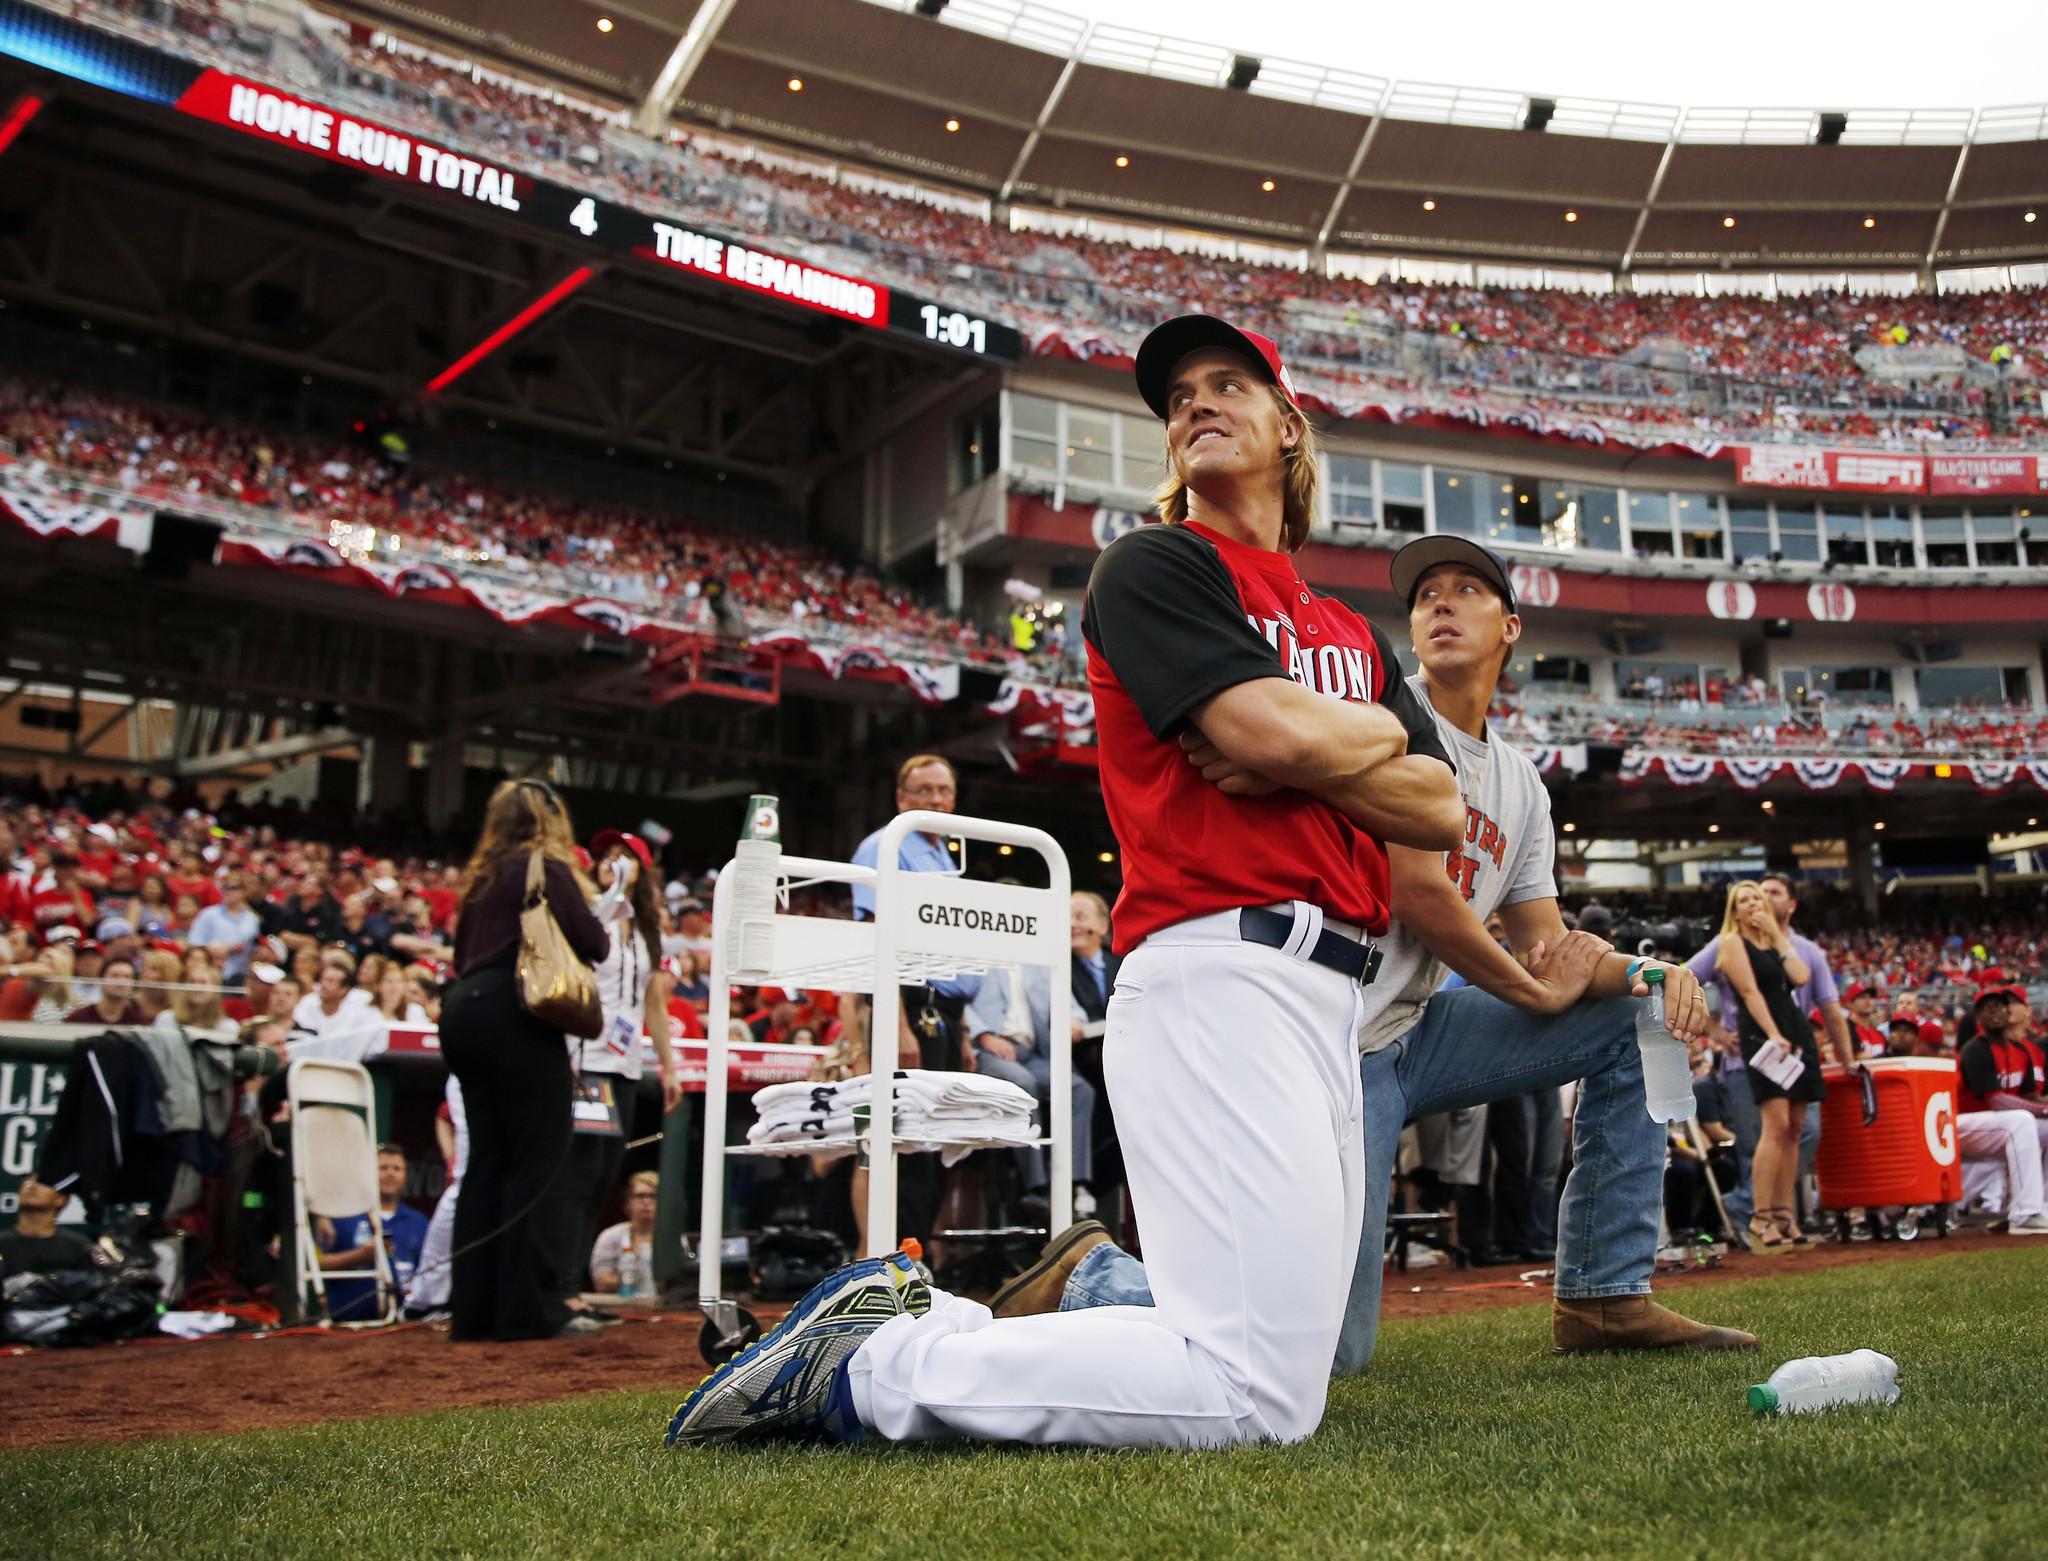 MLB Baseball game start time? | Yahoo Answers